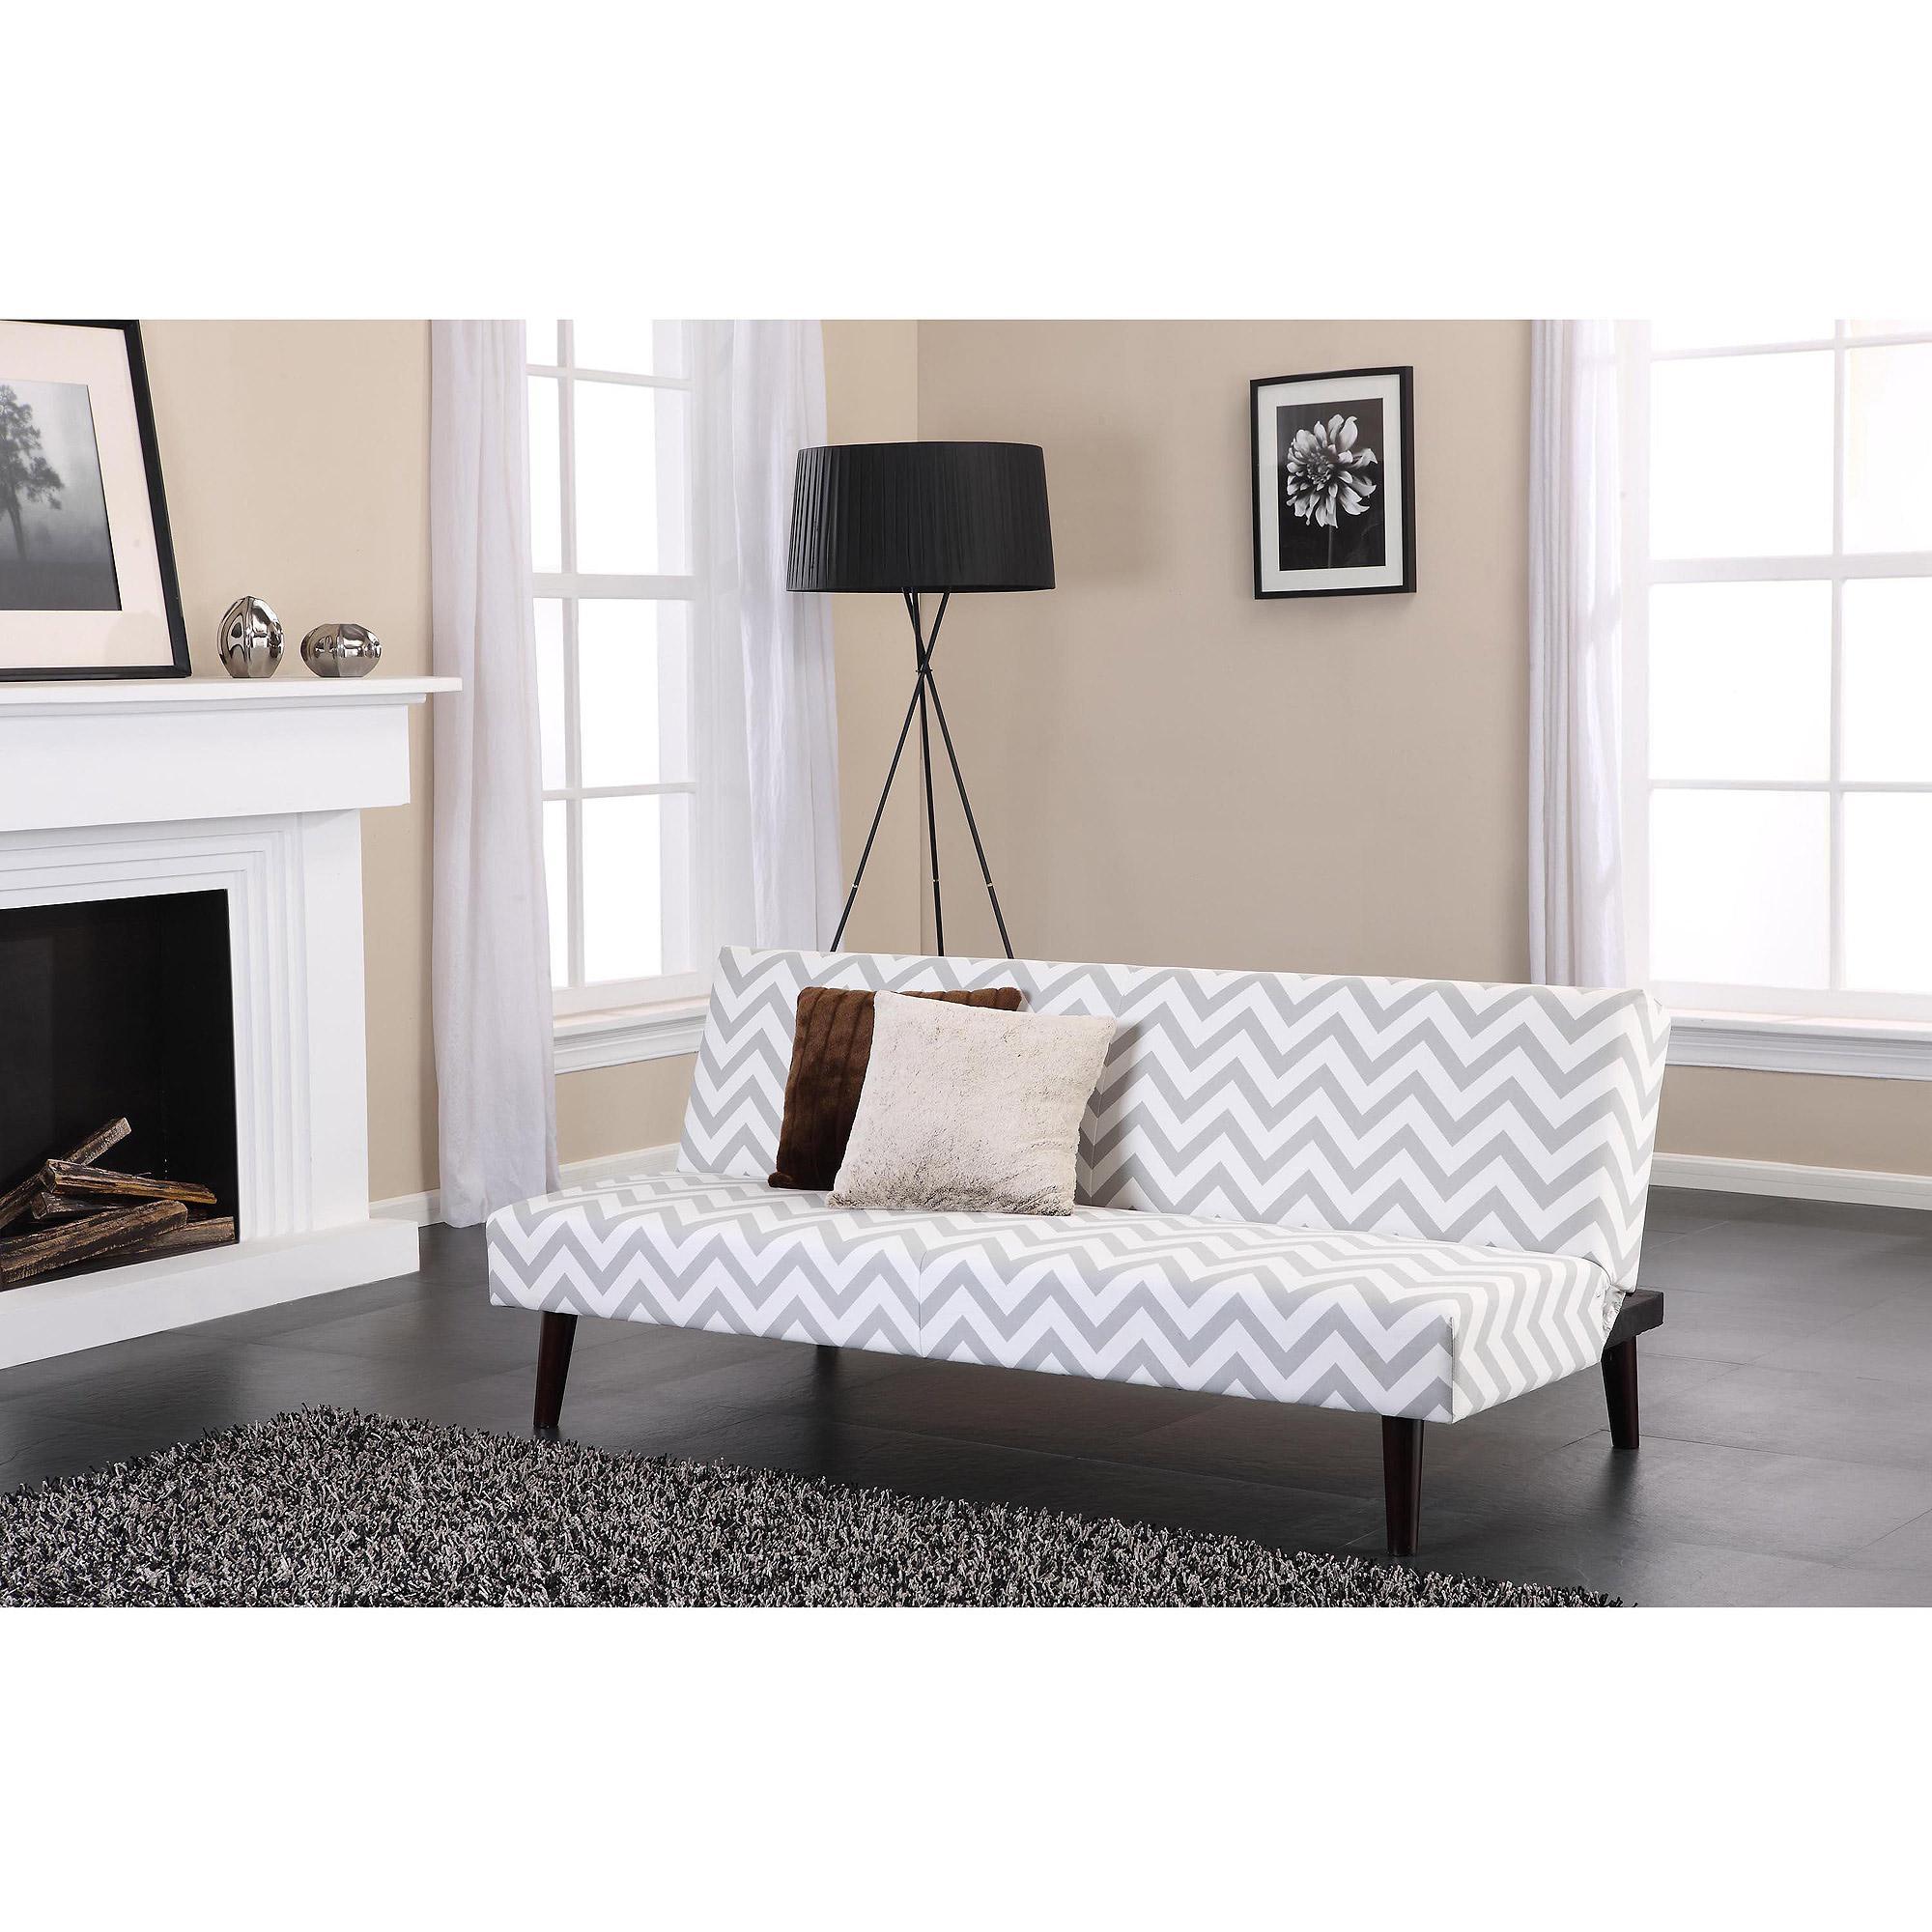 Furniture: Target Futons | Futon Beds Walmart | Couch Bed Walmart Intended For Target Couch Beds (Image 7 of 20)